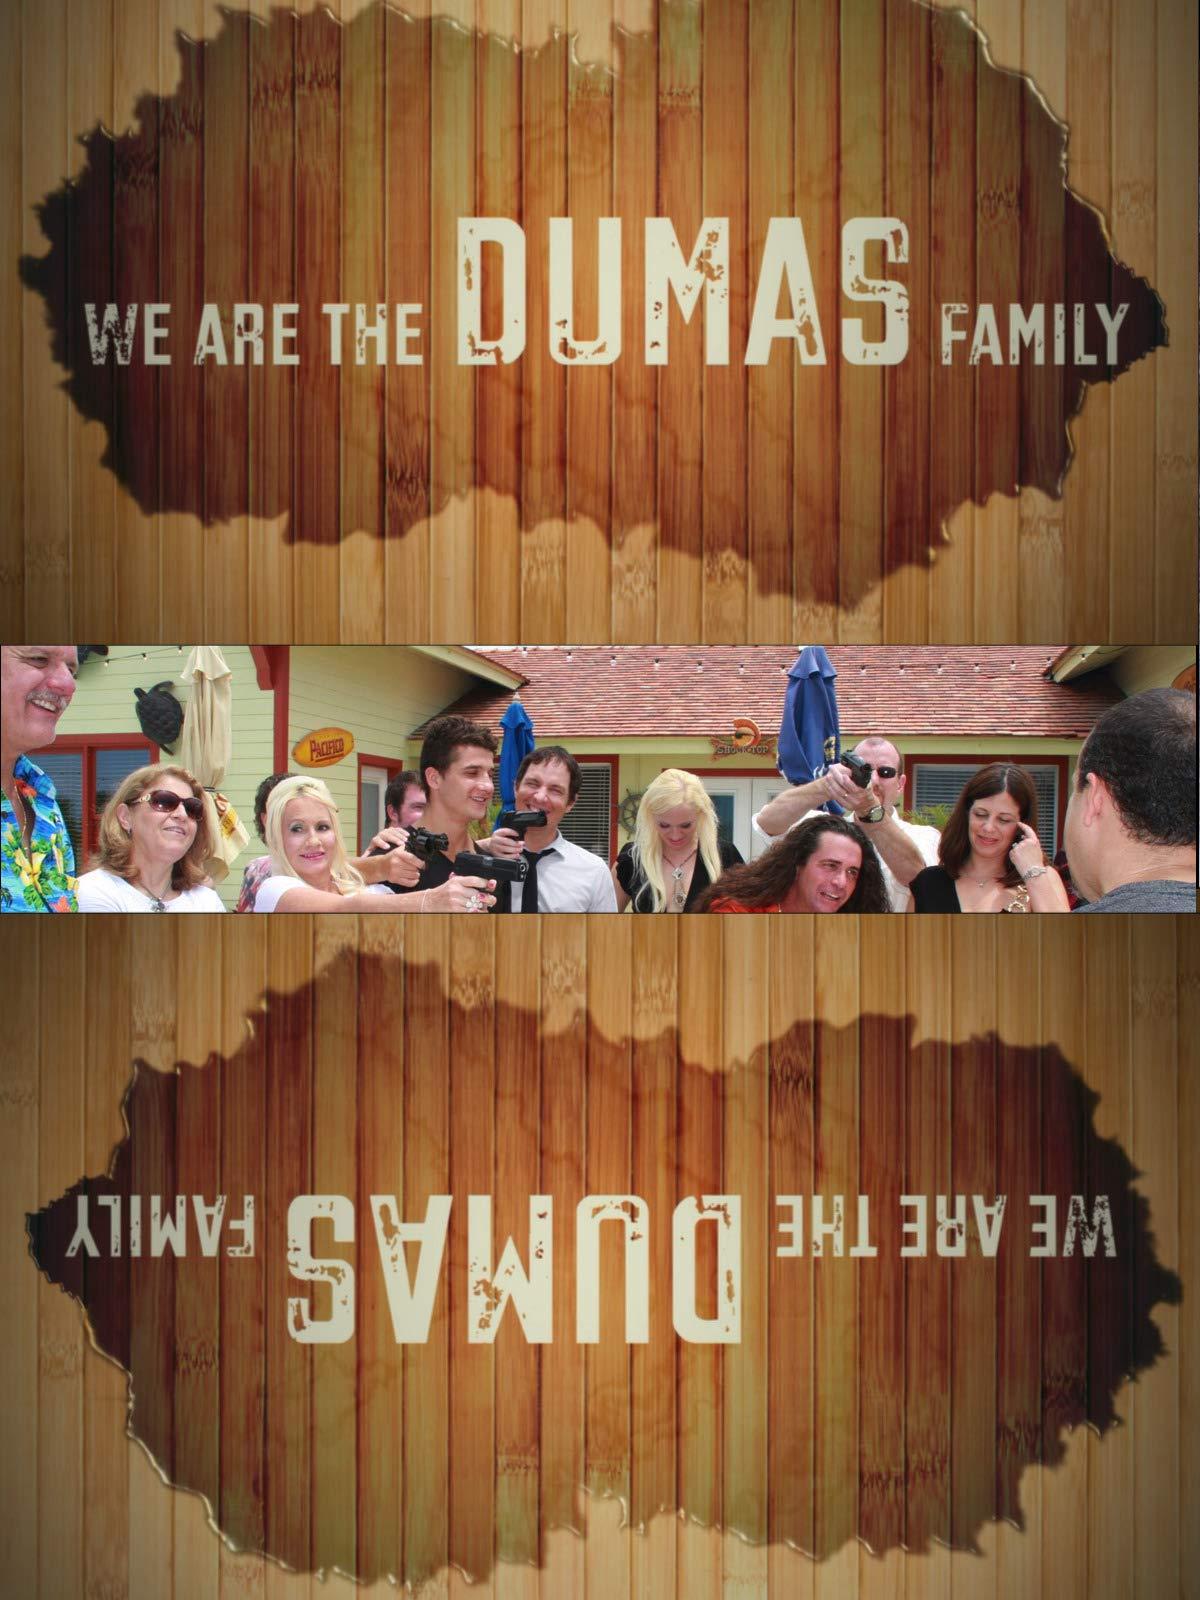 We Are The Dumas Family